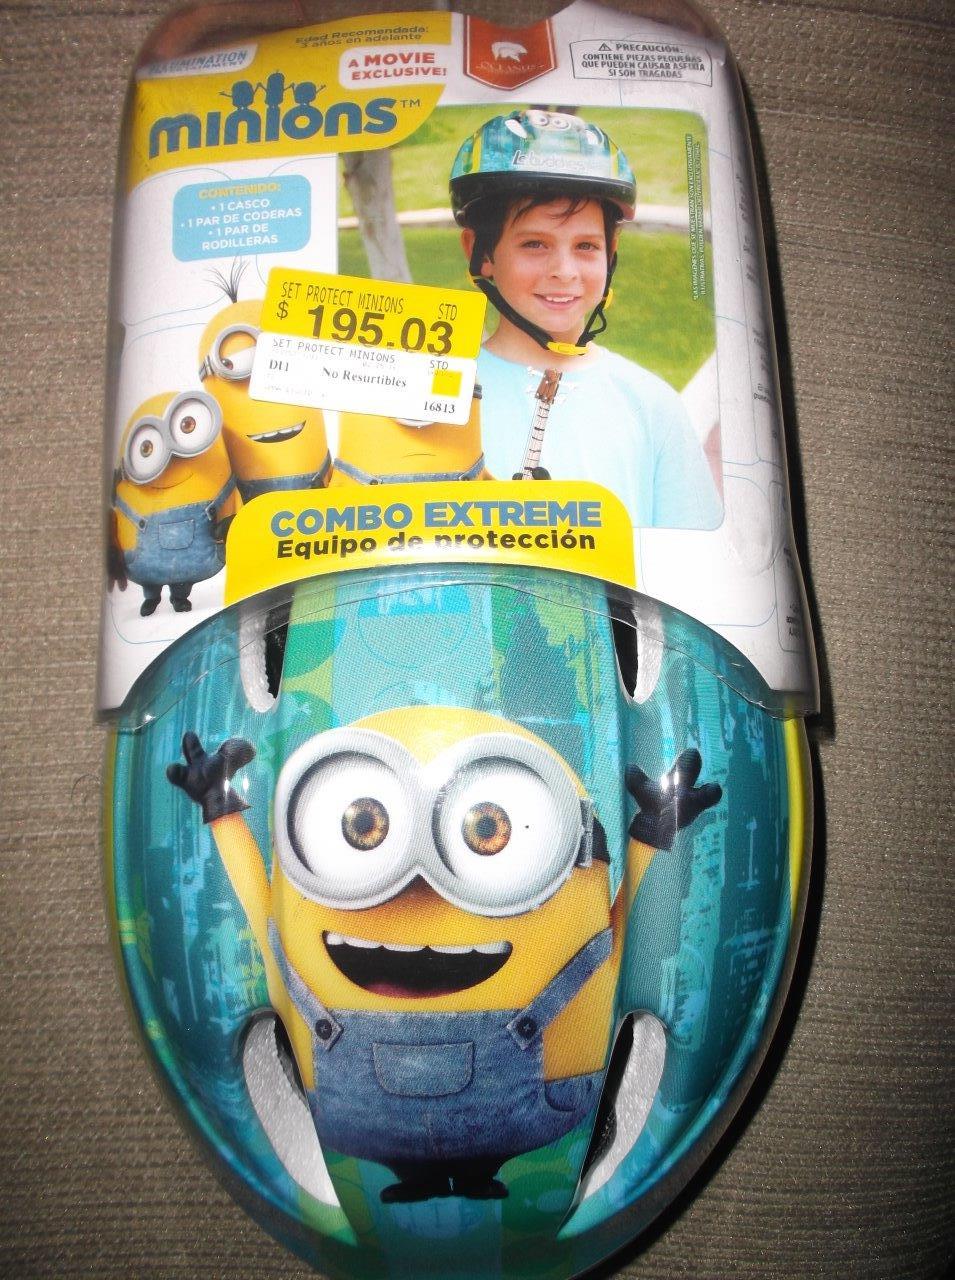 Walmart Perinorte: Set protector Minion para niño $35.01